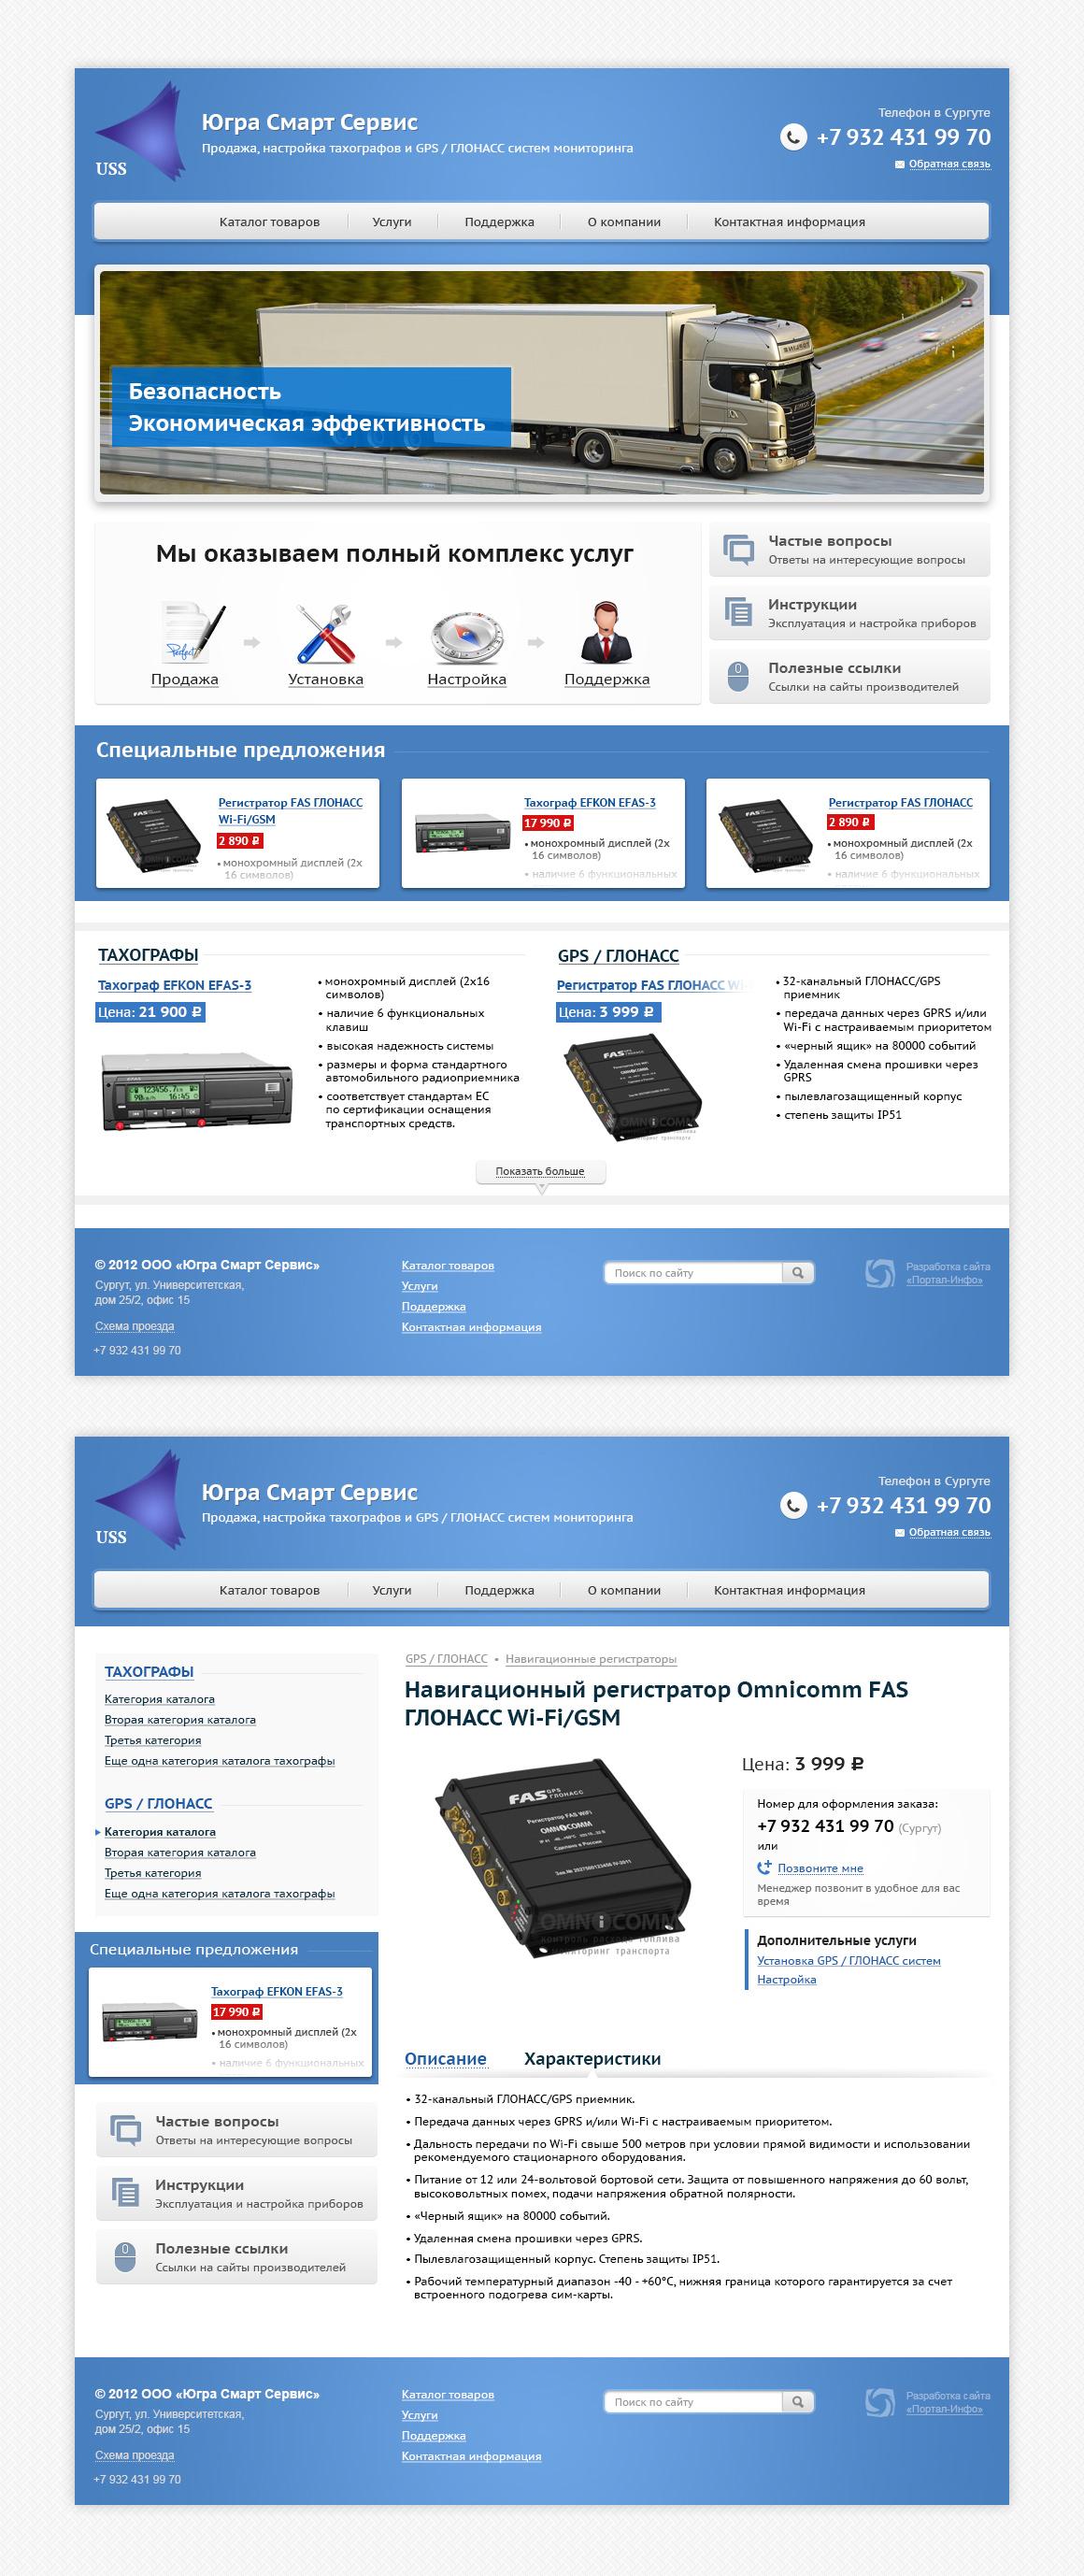 Дизайн сайта «Югра Смарт Сервис»